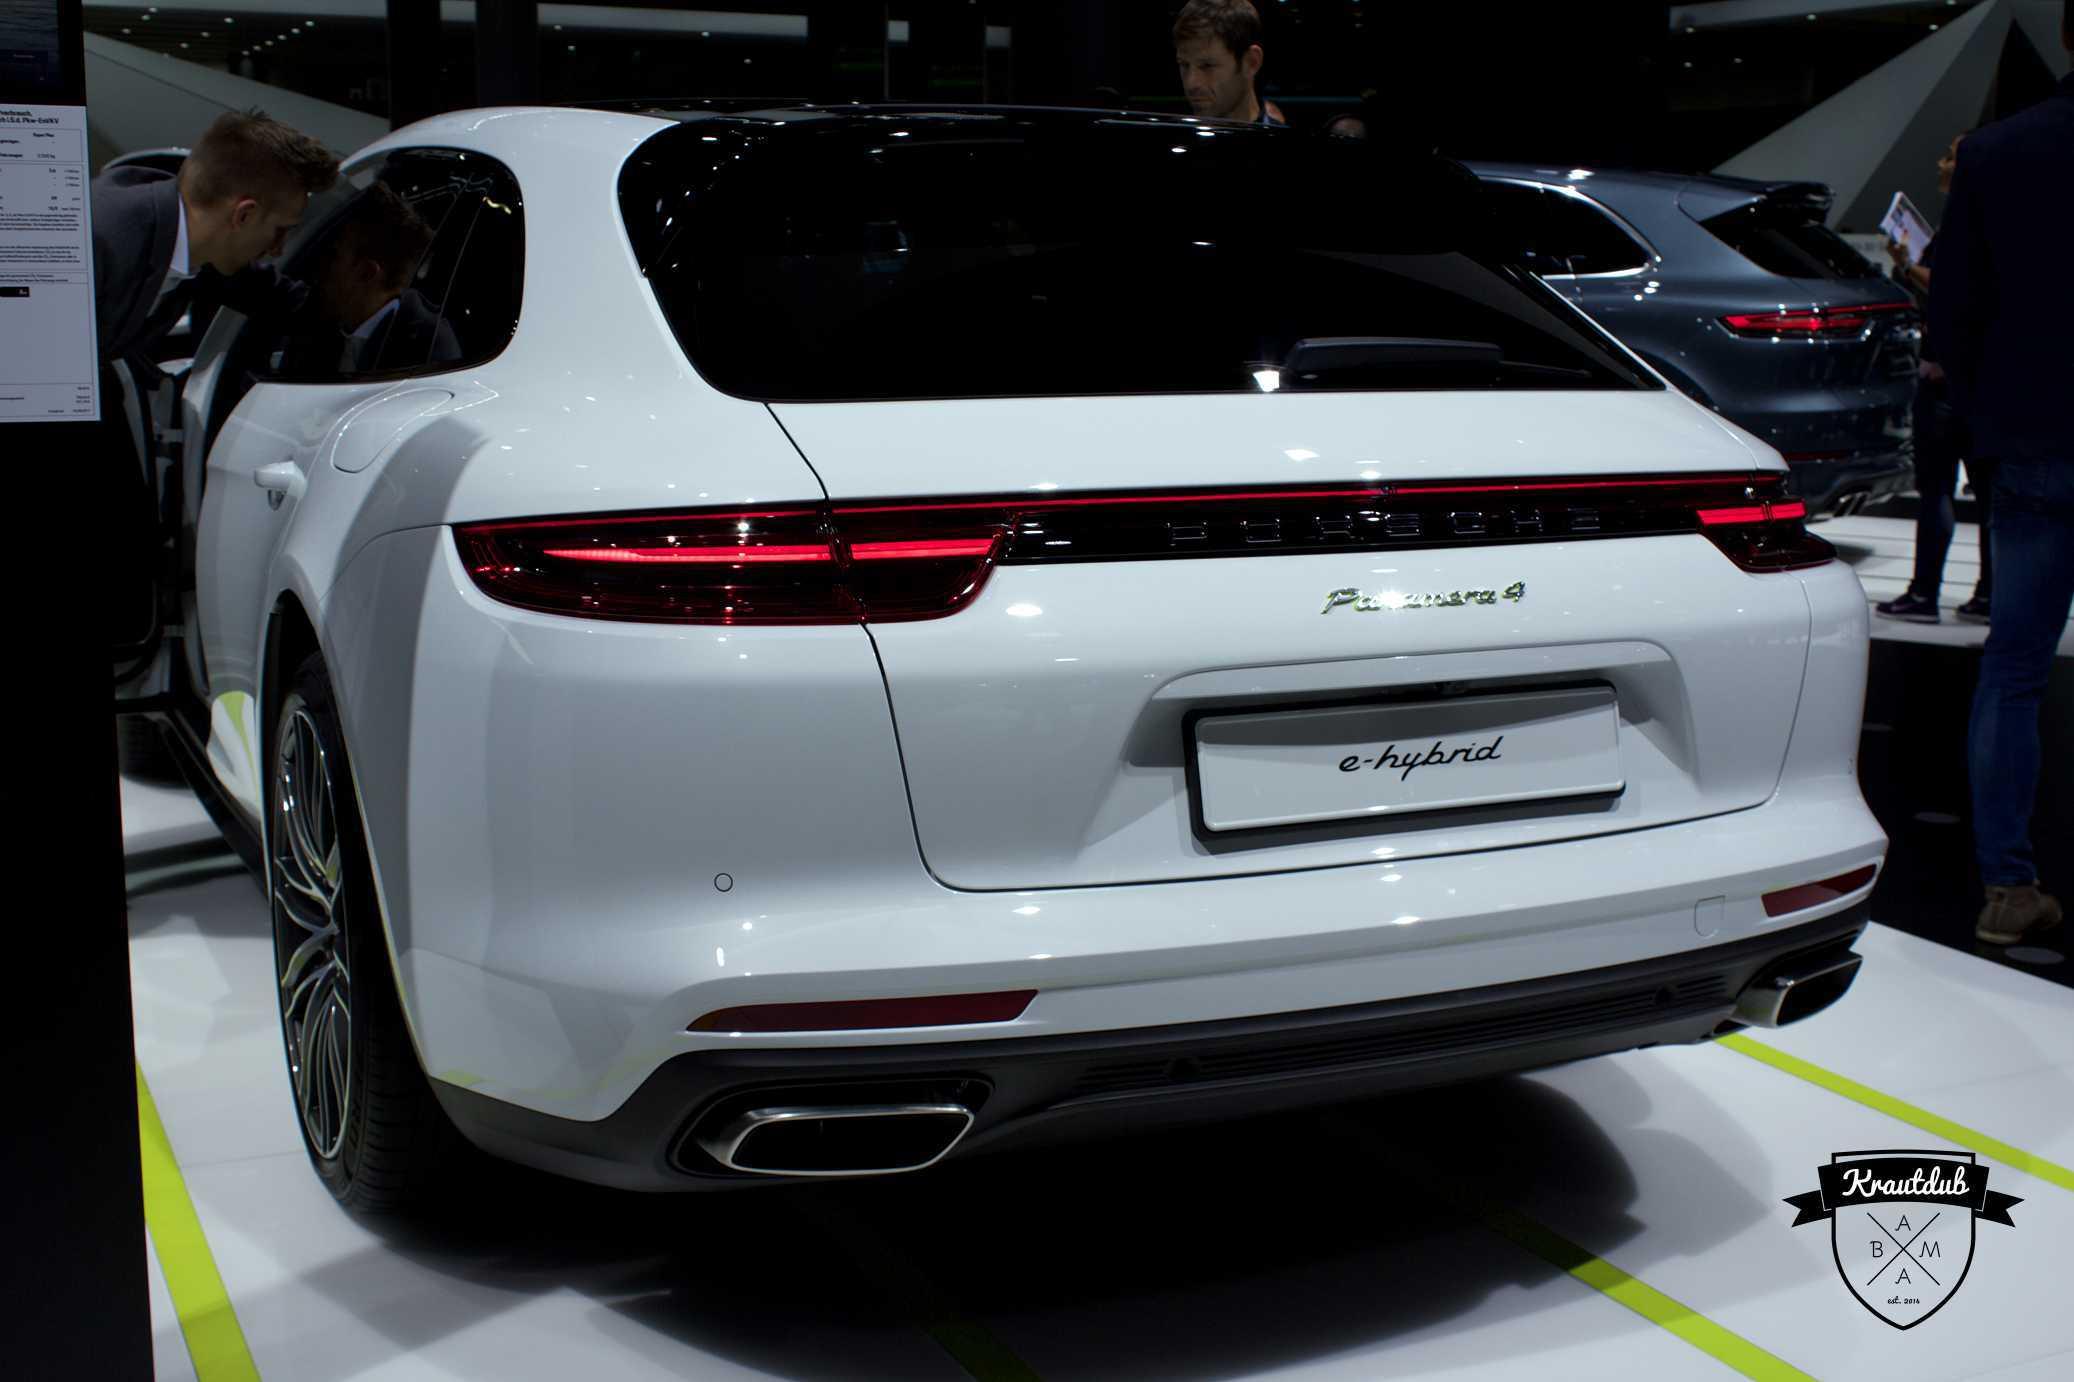 Porsche Panamera s e-hybrid - IAA 2017